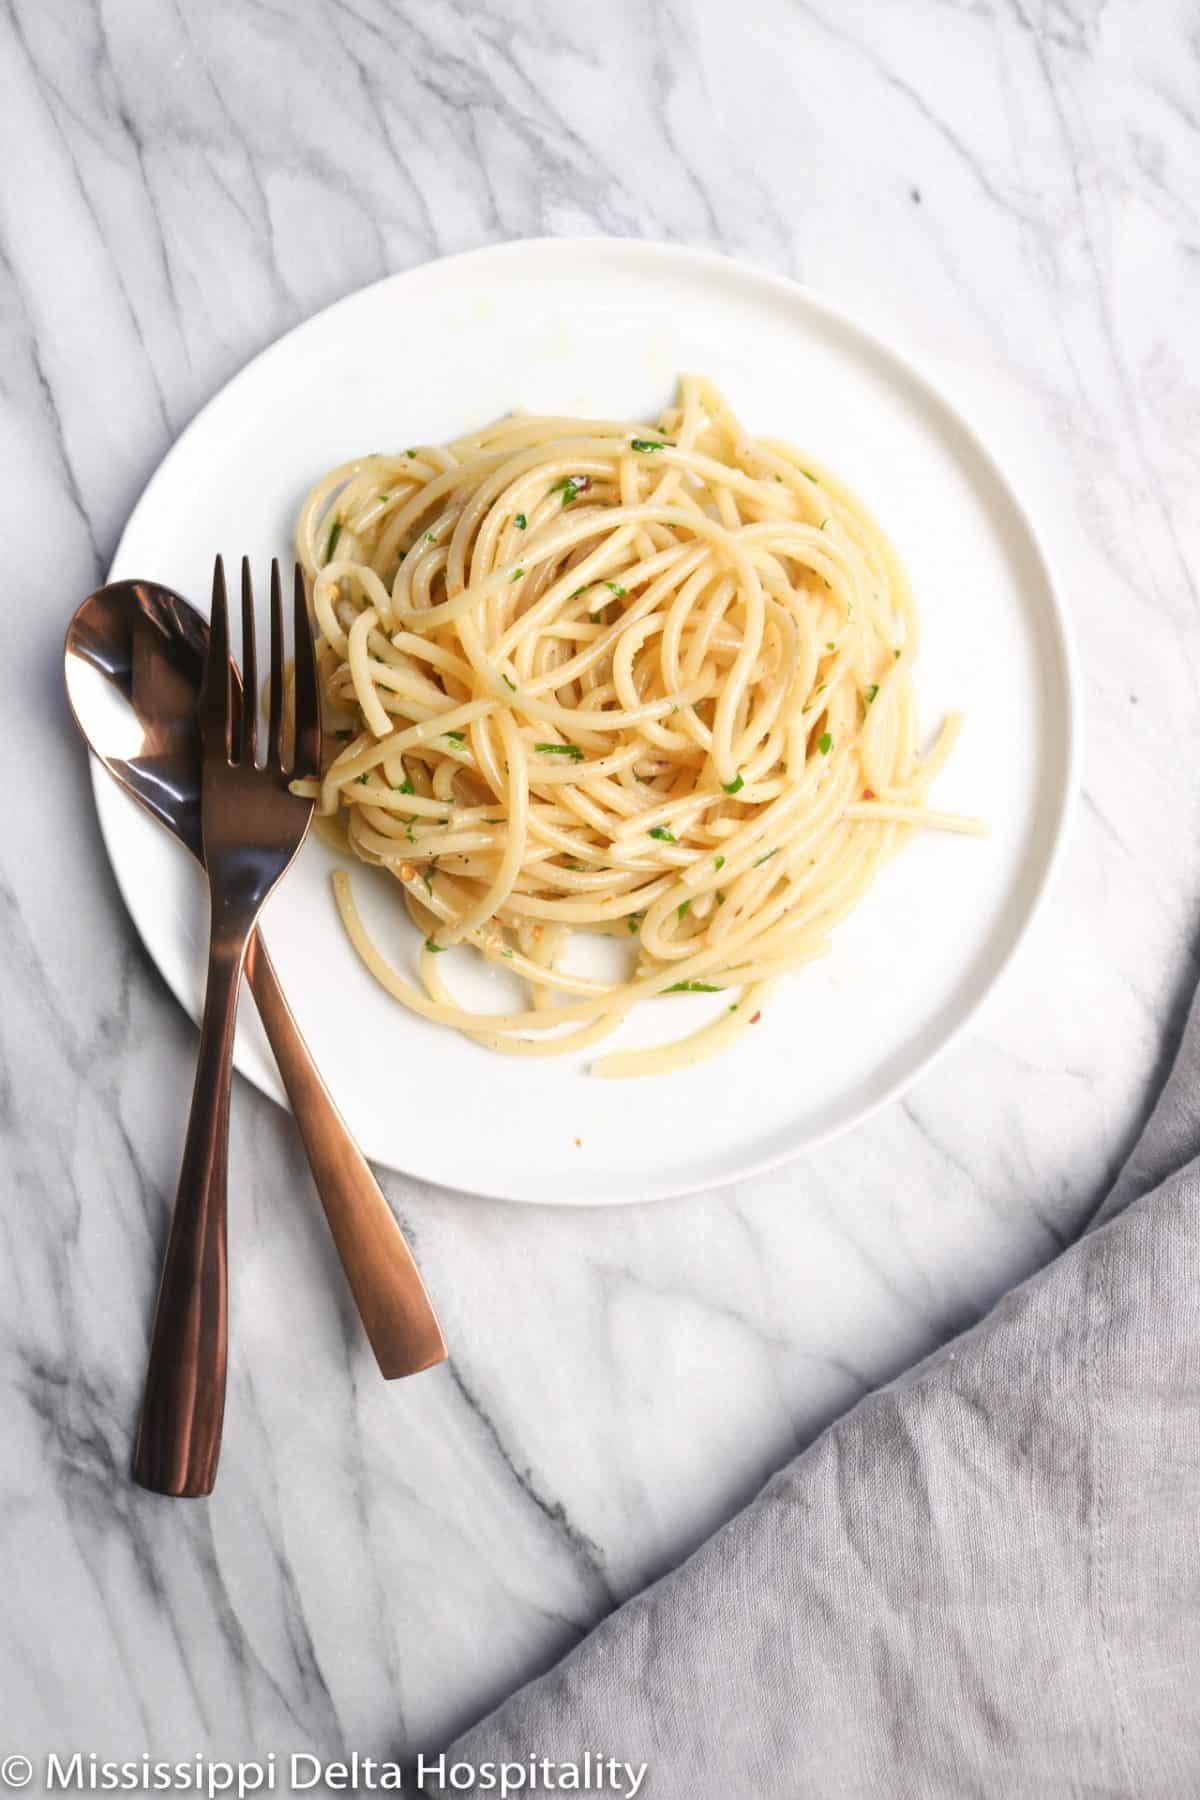 spaghetti aglio e olio on a white plate with a copper spoon and fork and a grey napkin